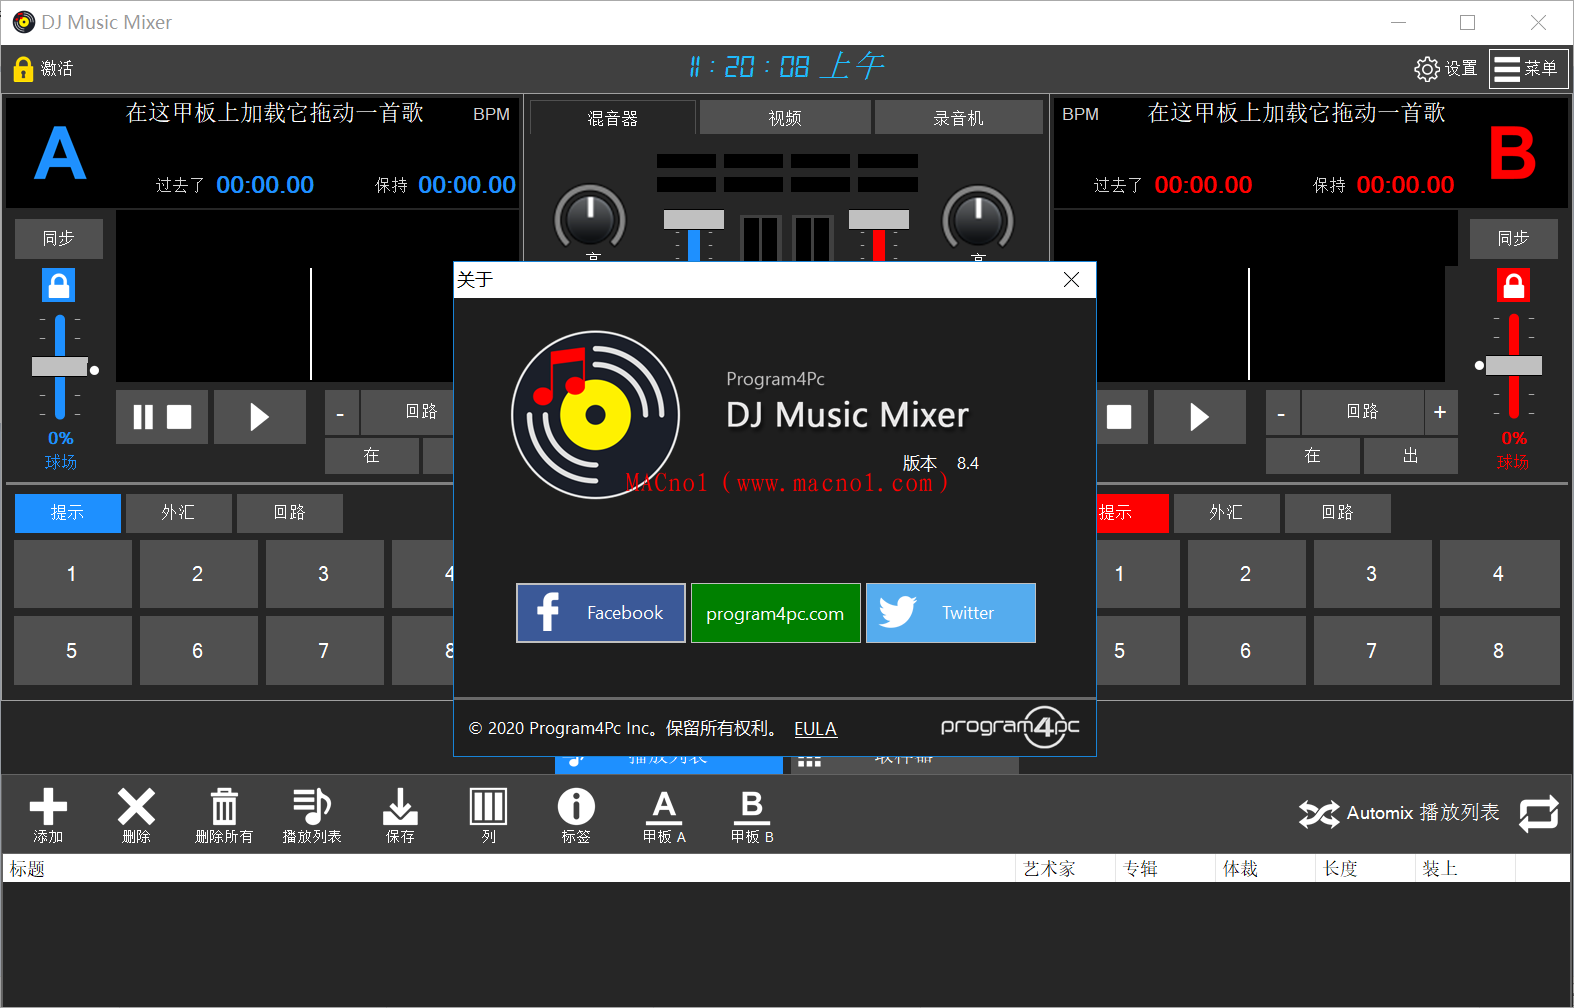 Program4Pc DJ Music Mixer 破解版.png